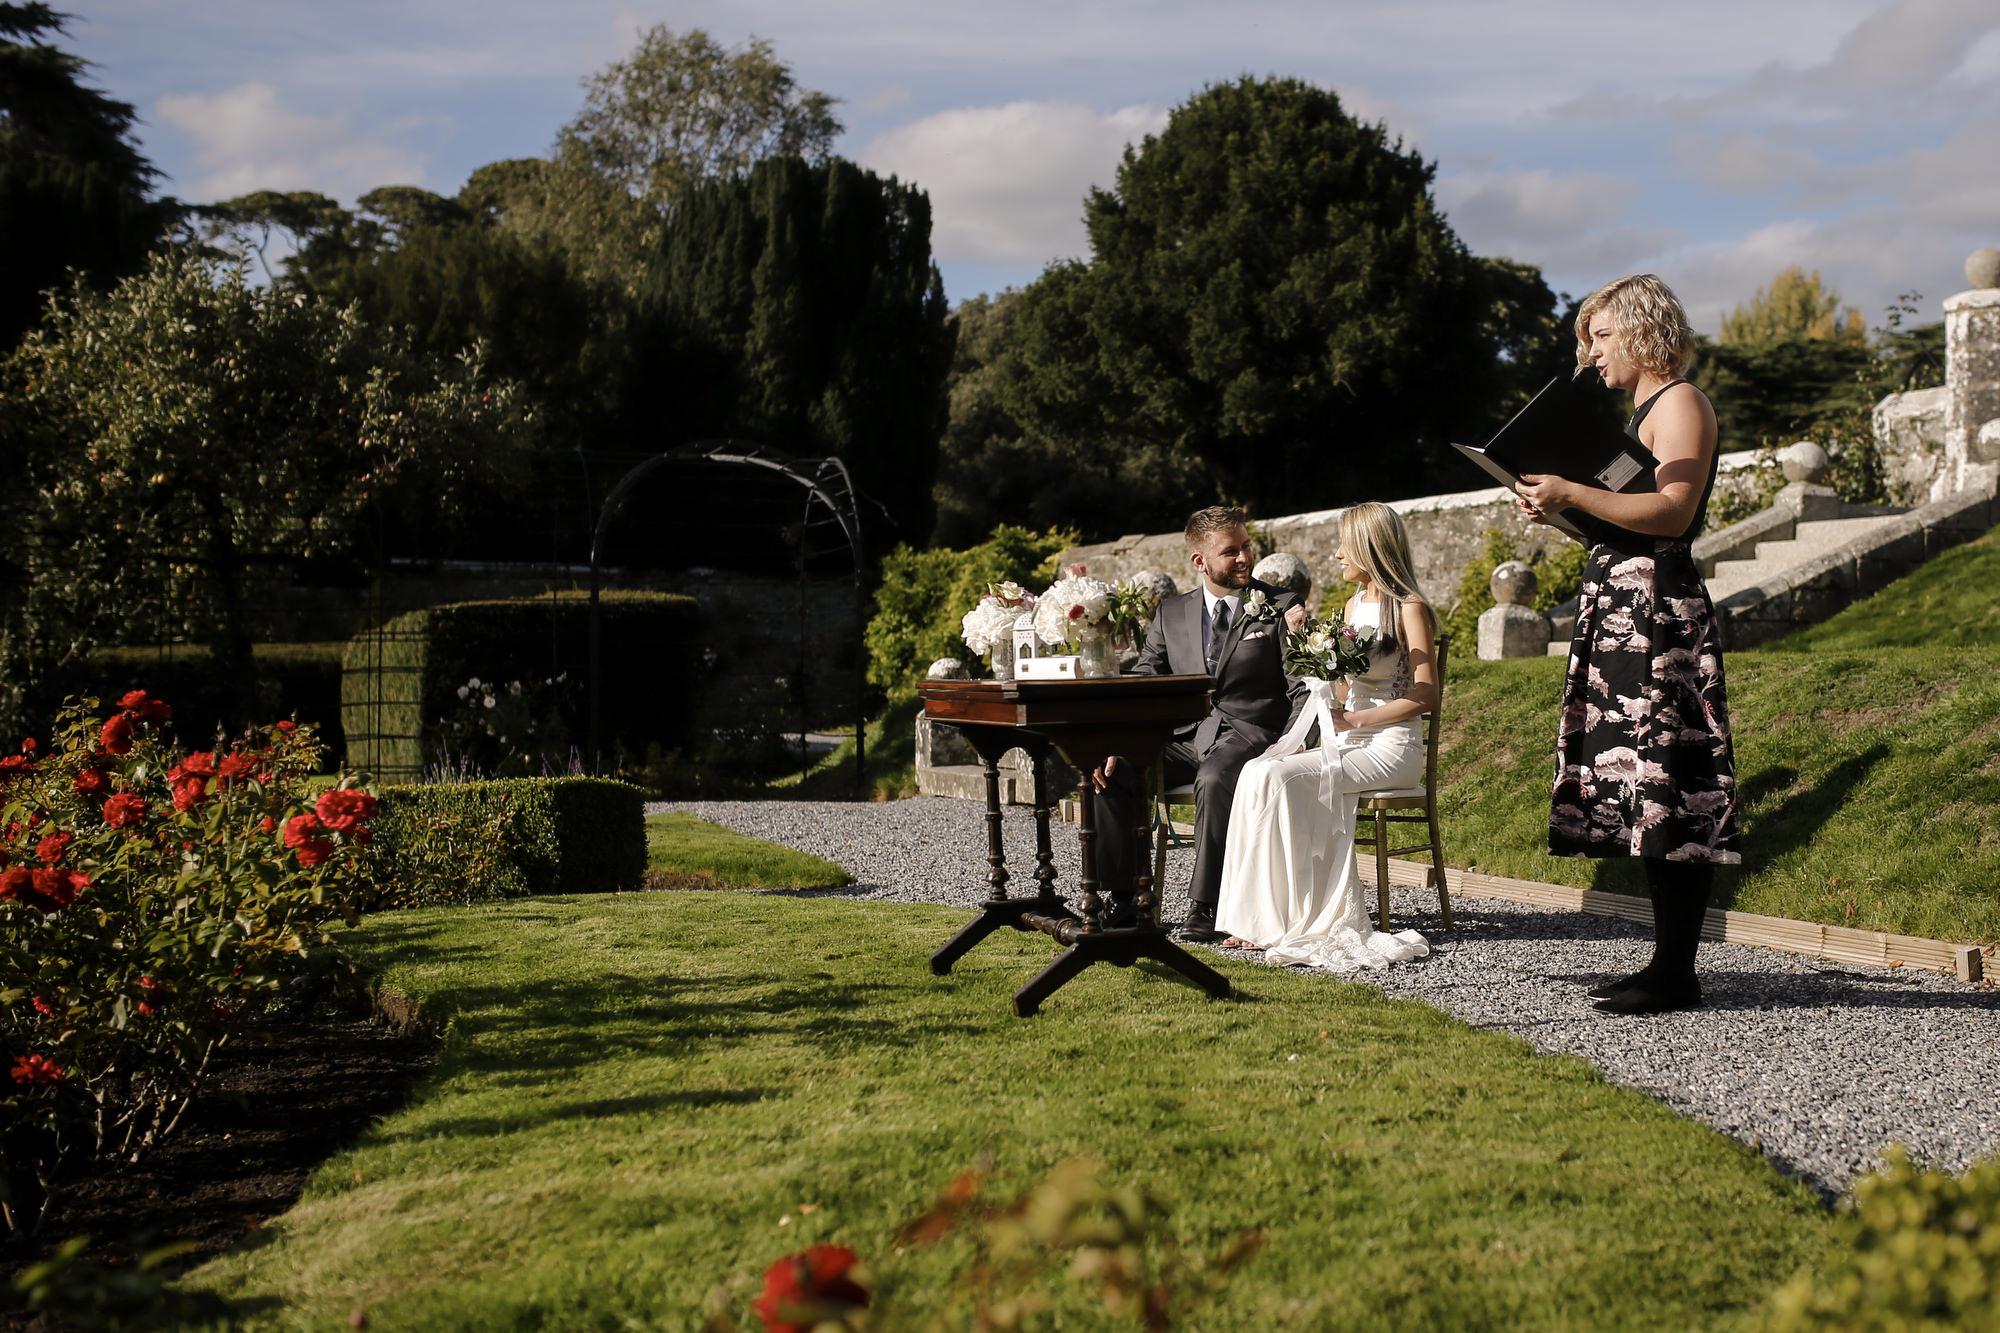 kilkea_castle_wedding_photographer_goldenmoments_026.jpg